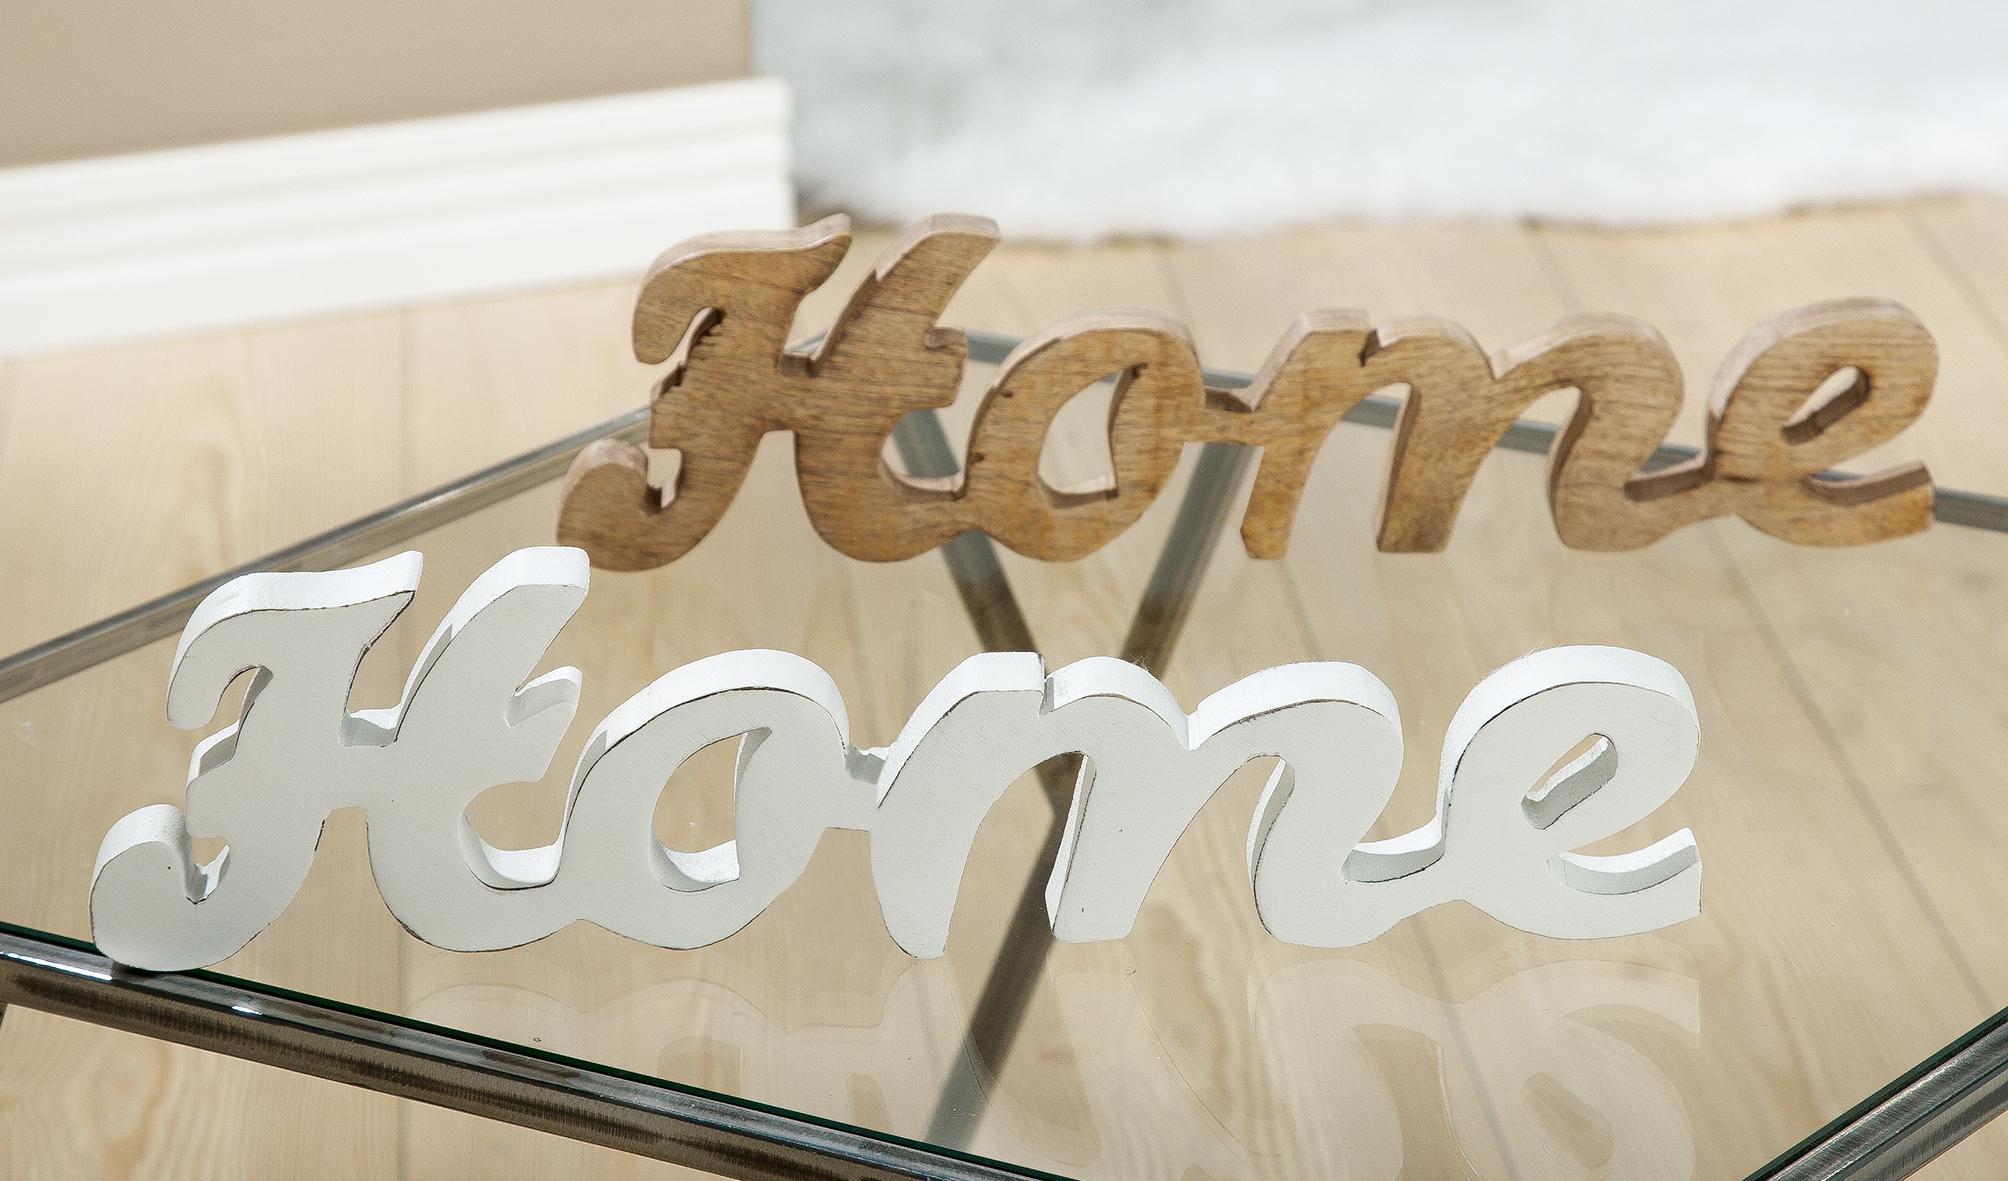 Gilde Handwerk Schriftzug Home aus Mango Holz Breite 39 cm